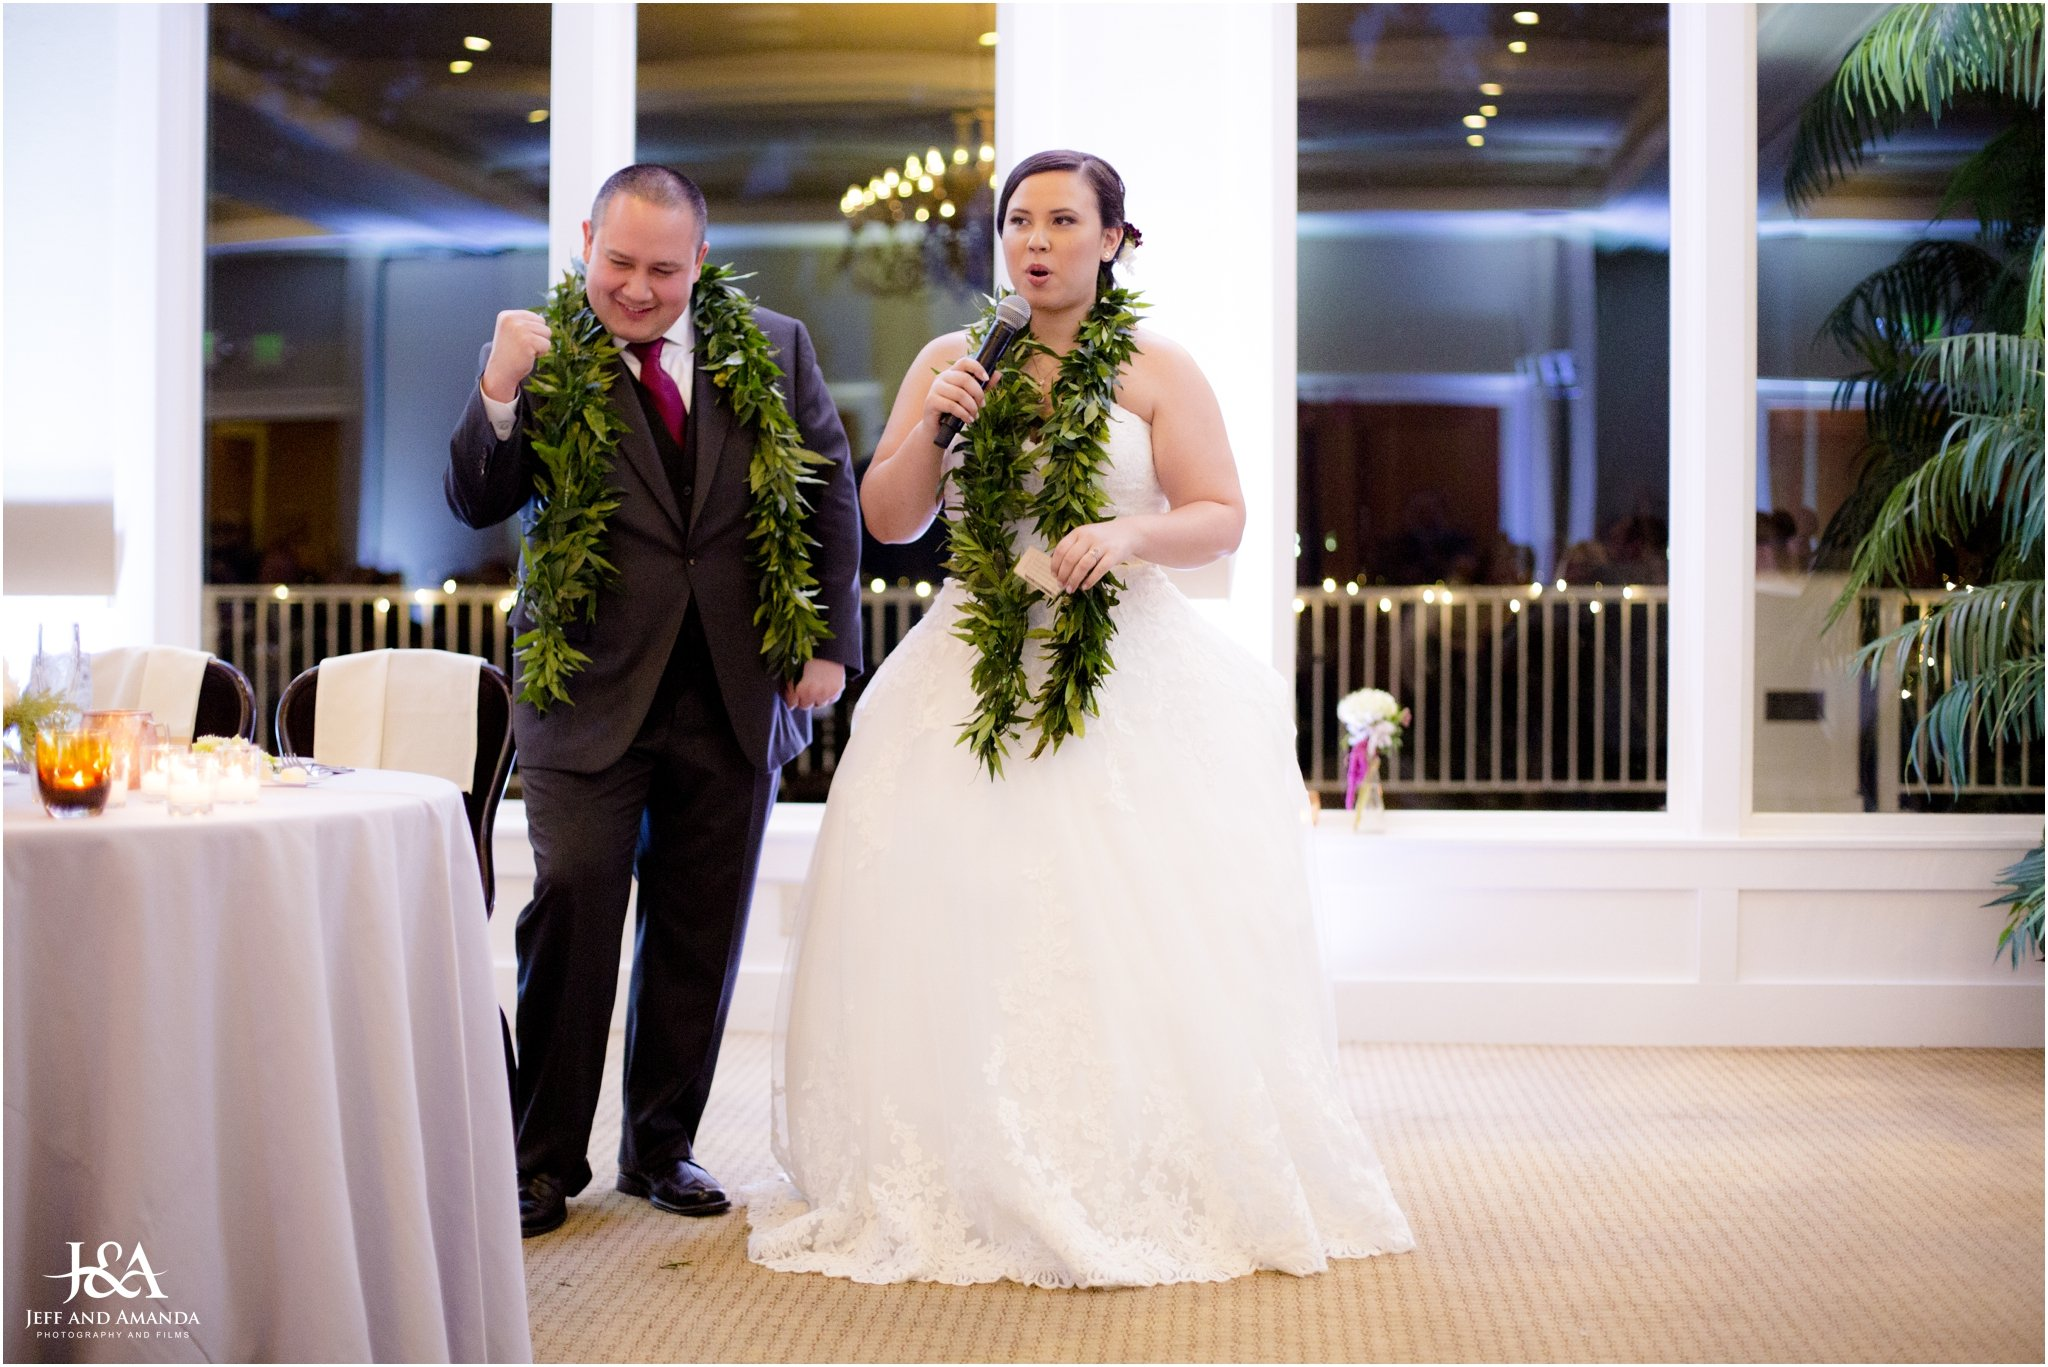 Dave and Kari s Wedding-Facebook Ready-0471.jpg